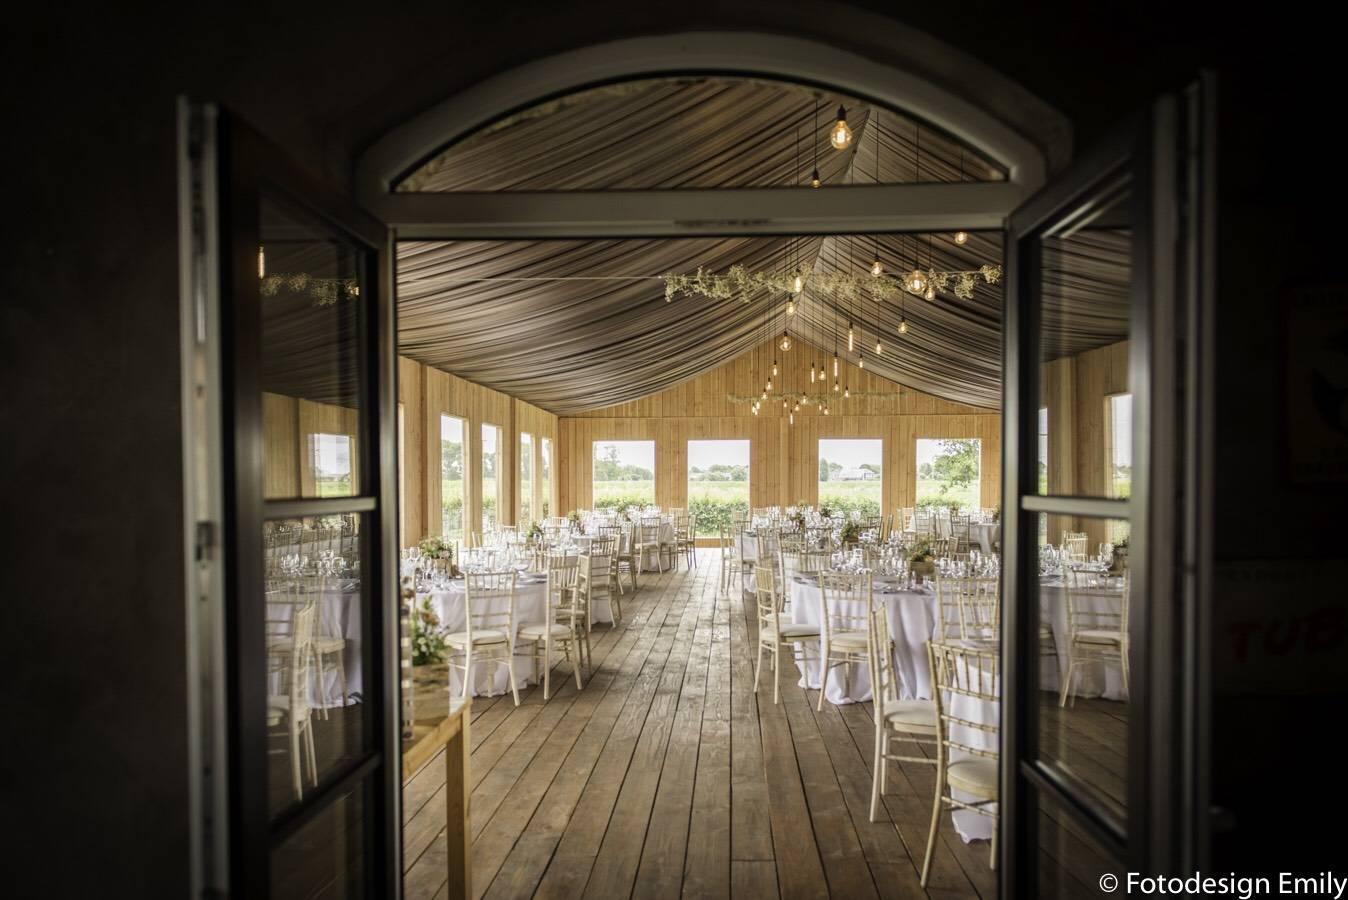 House of Weddings Domein t Eikennest Feestzaal West-Vlaanderen Diksmuide Beerst 6